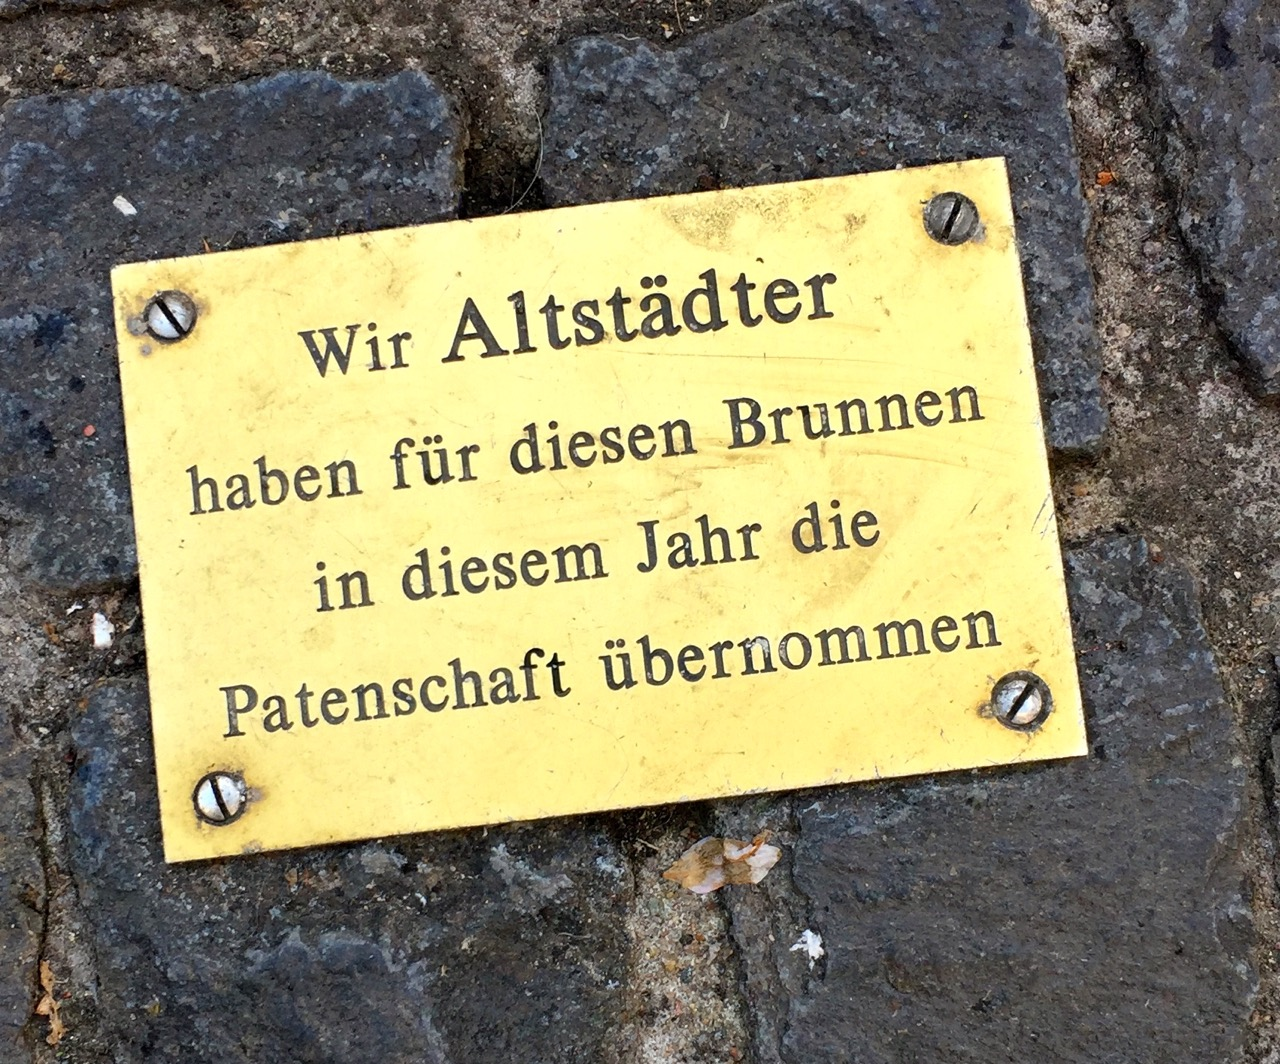 Altstadtbrunnen in Bonn